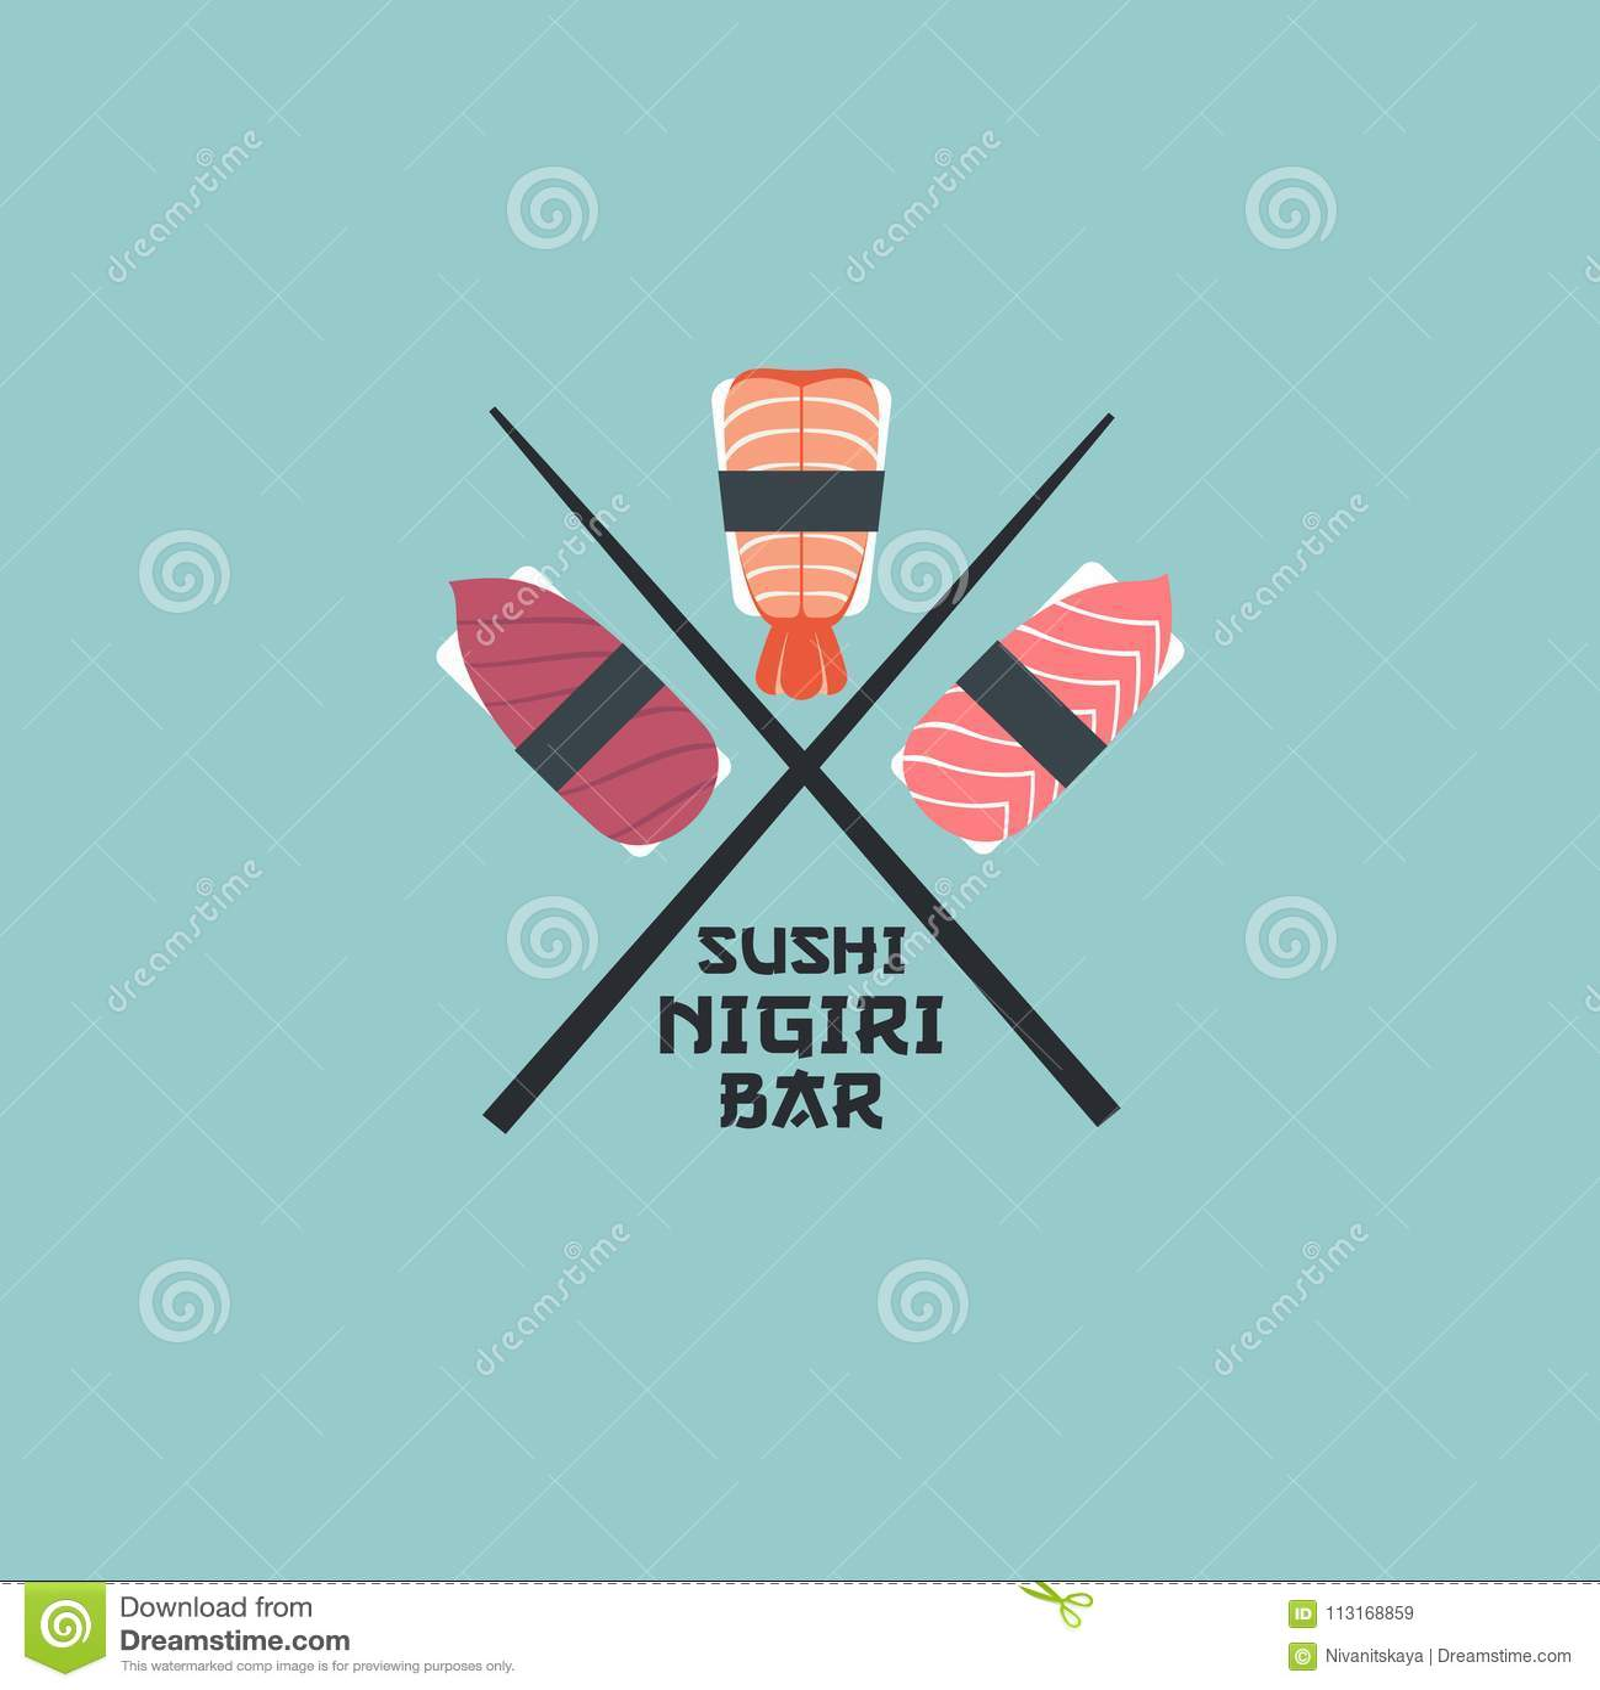 Sushi nigiri logo. Sushi restaurant emblem. Nigiri with fish and shrimps on a light background